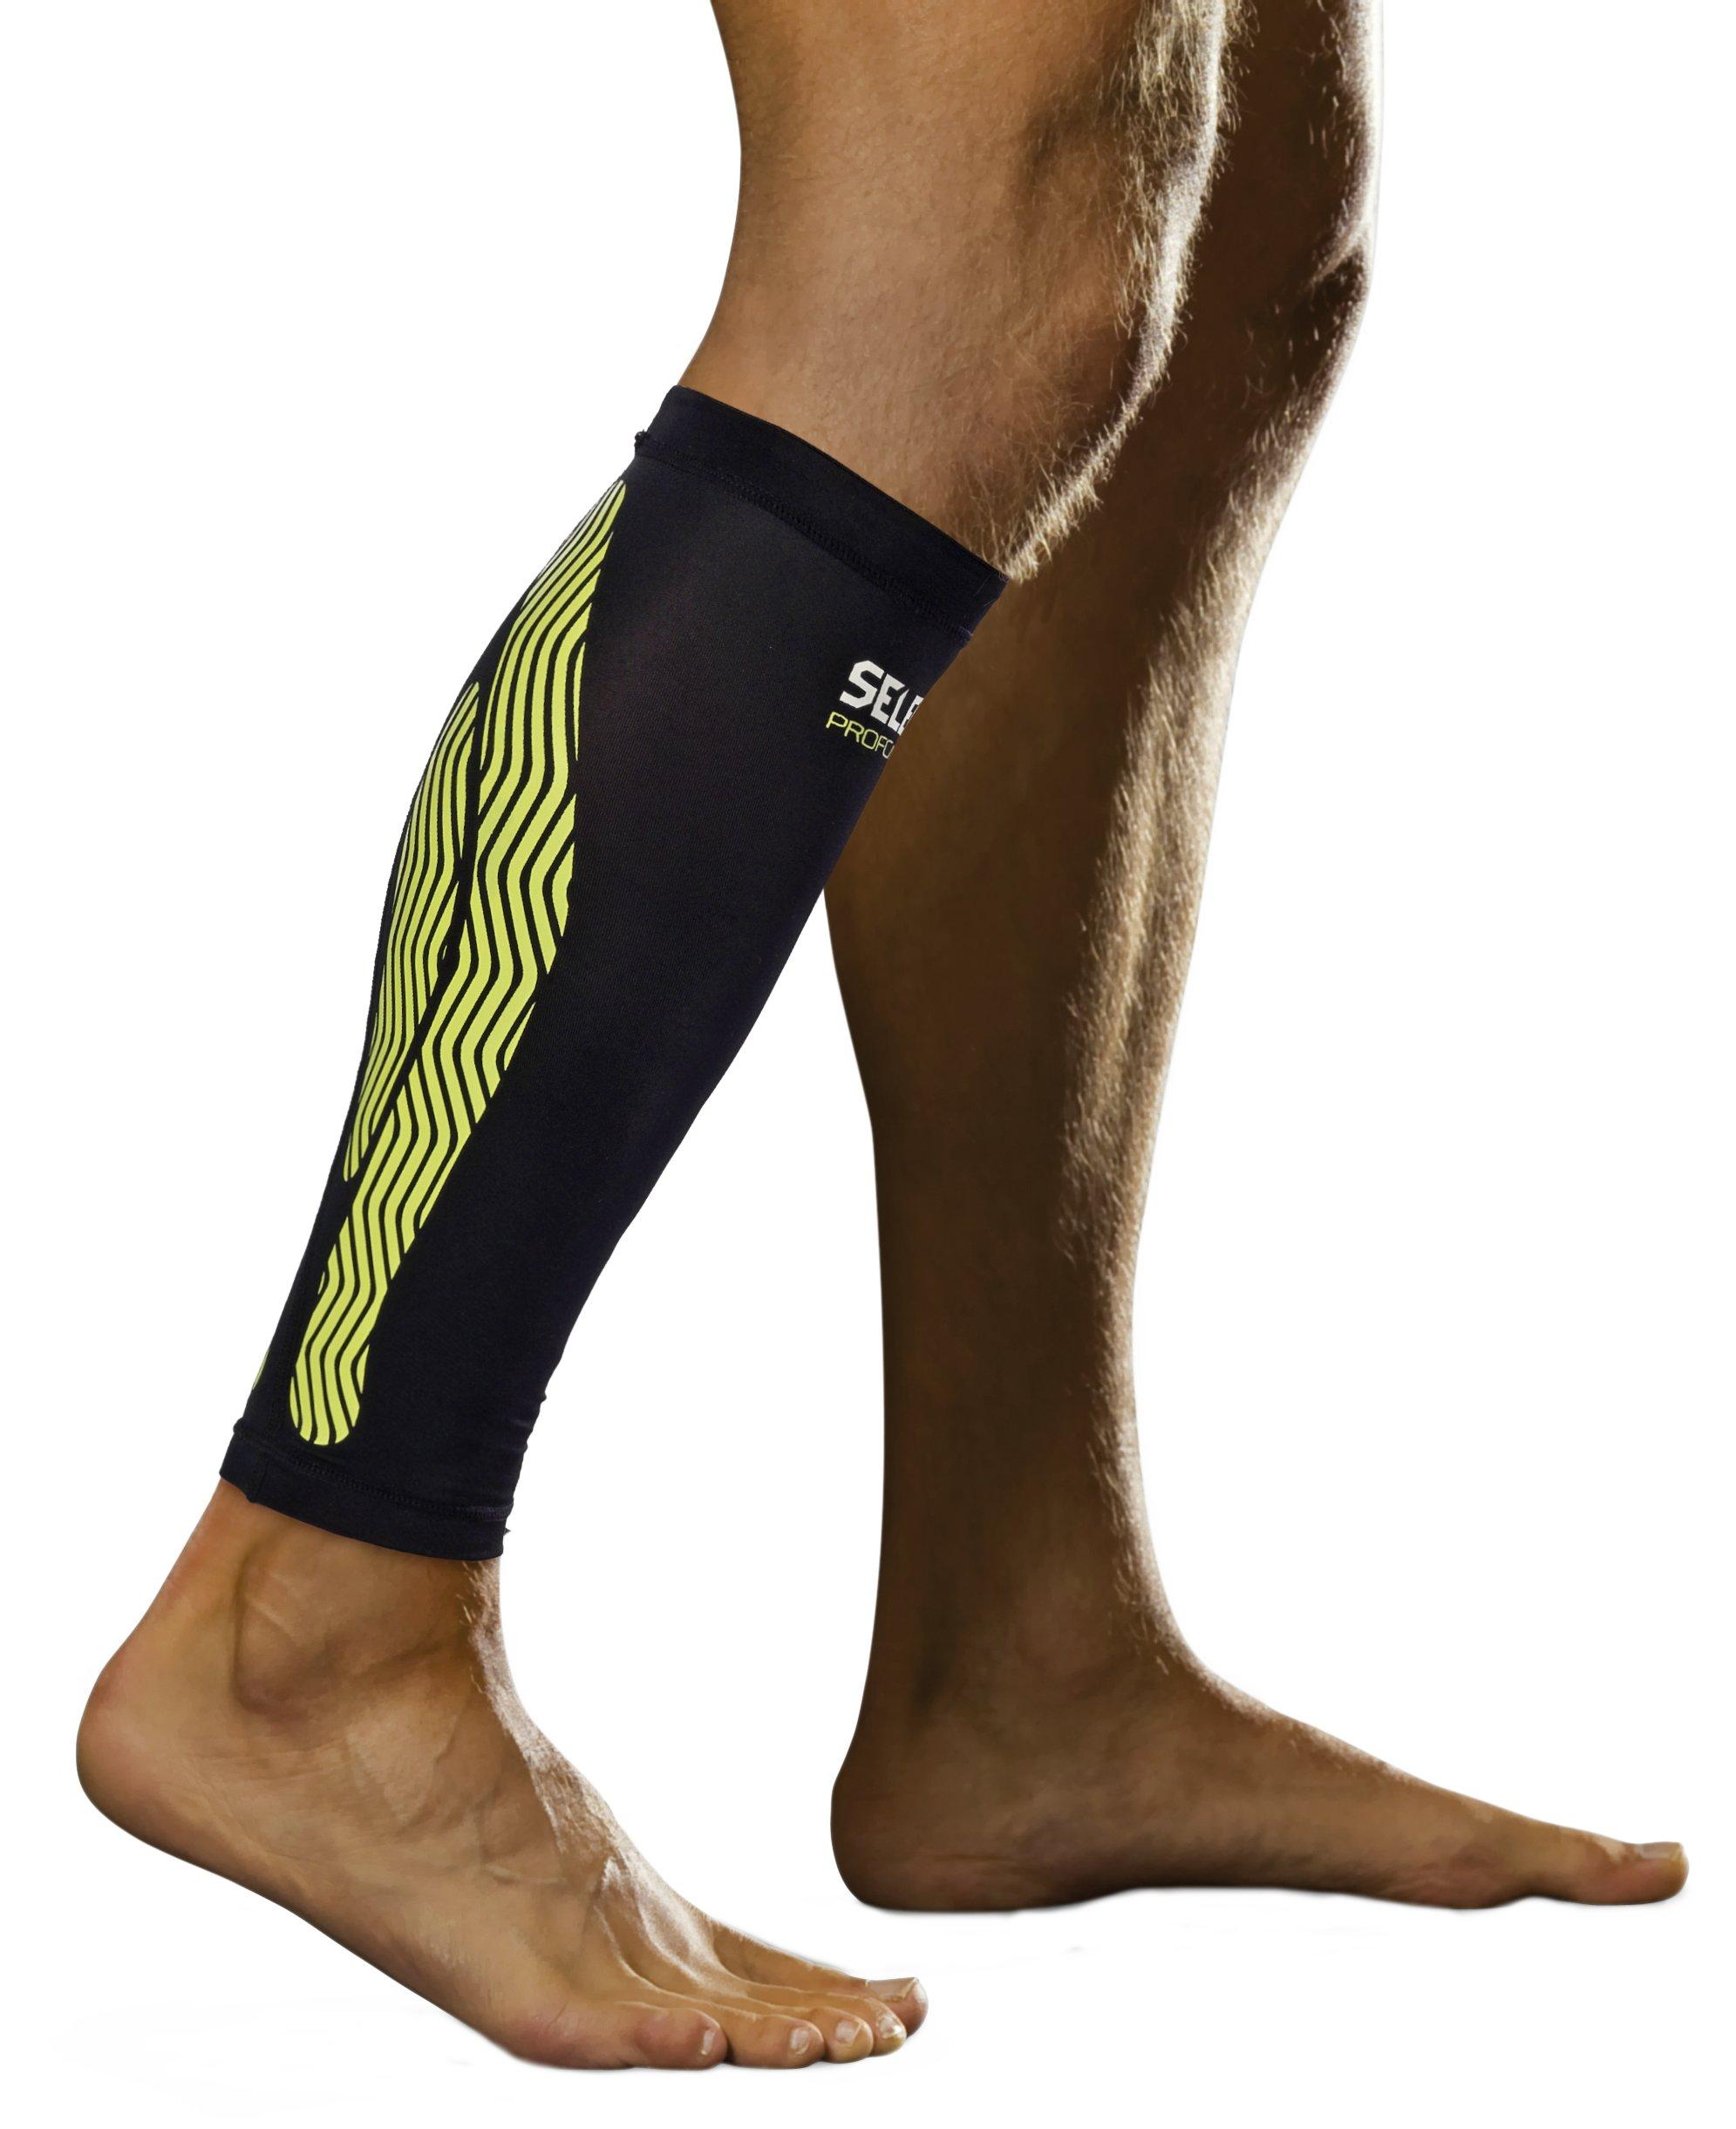 Vyberte Ponožky Compression Bands Calf 6150 S